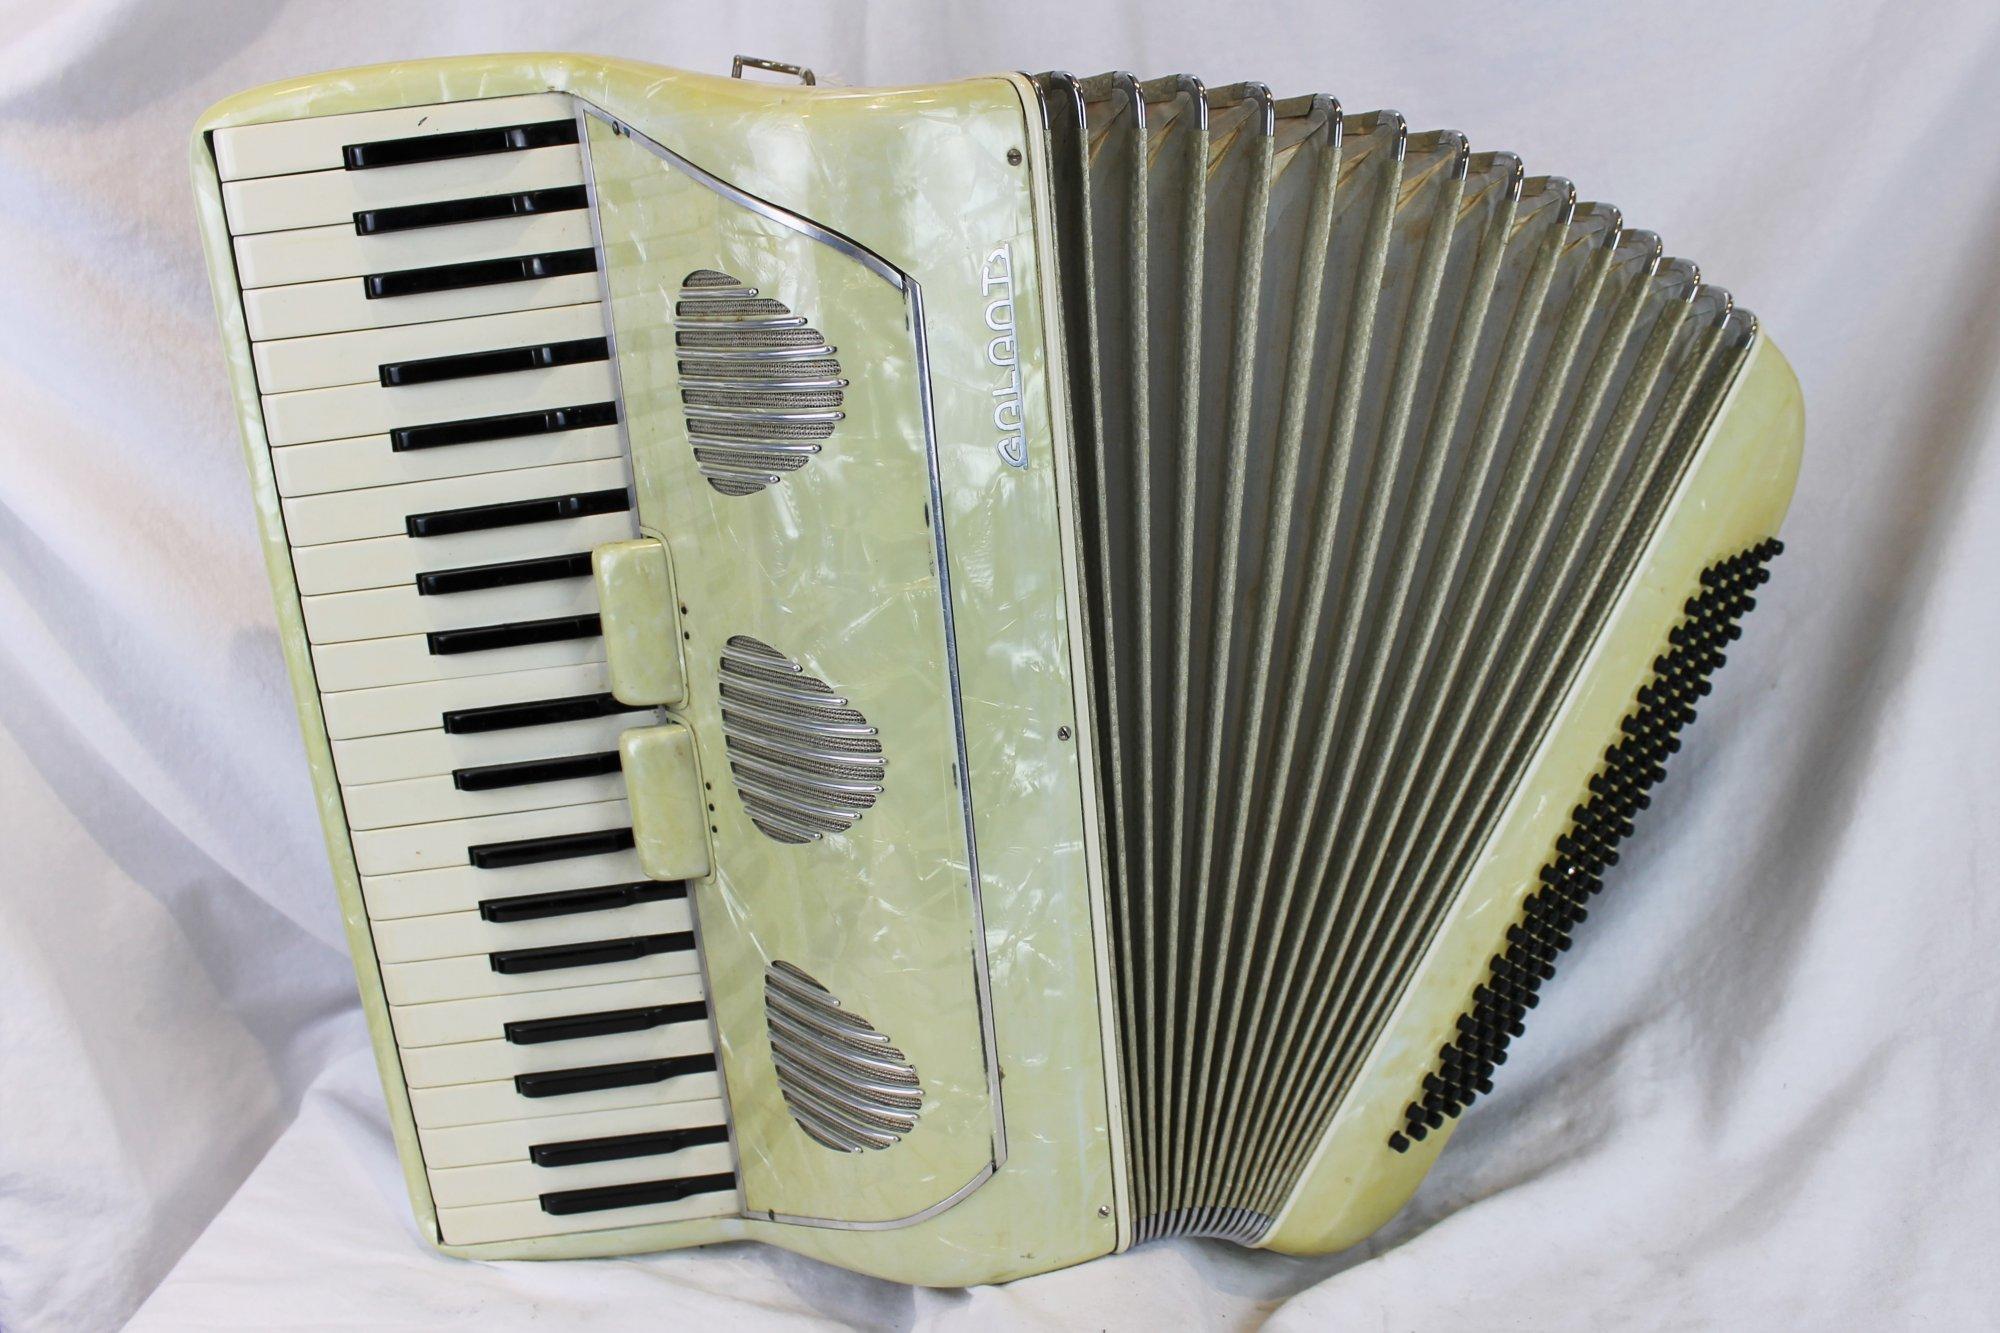 4641 - Cream Galanti Piano Accordion MMM 41 120